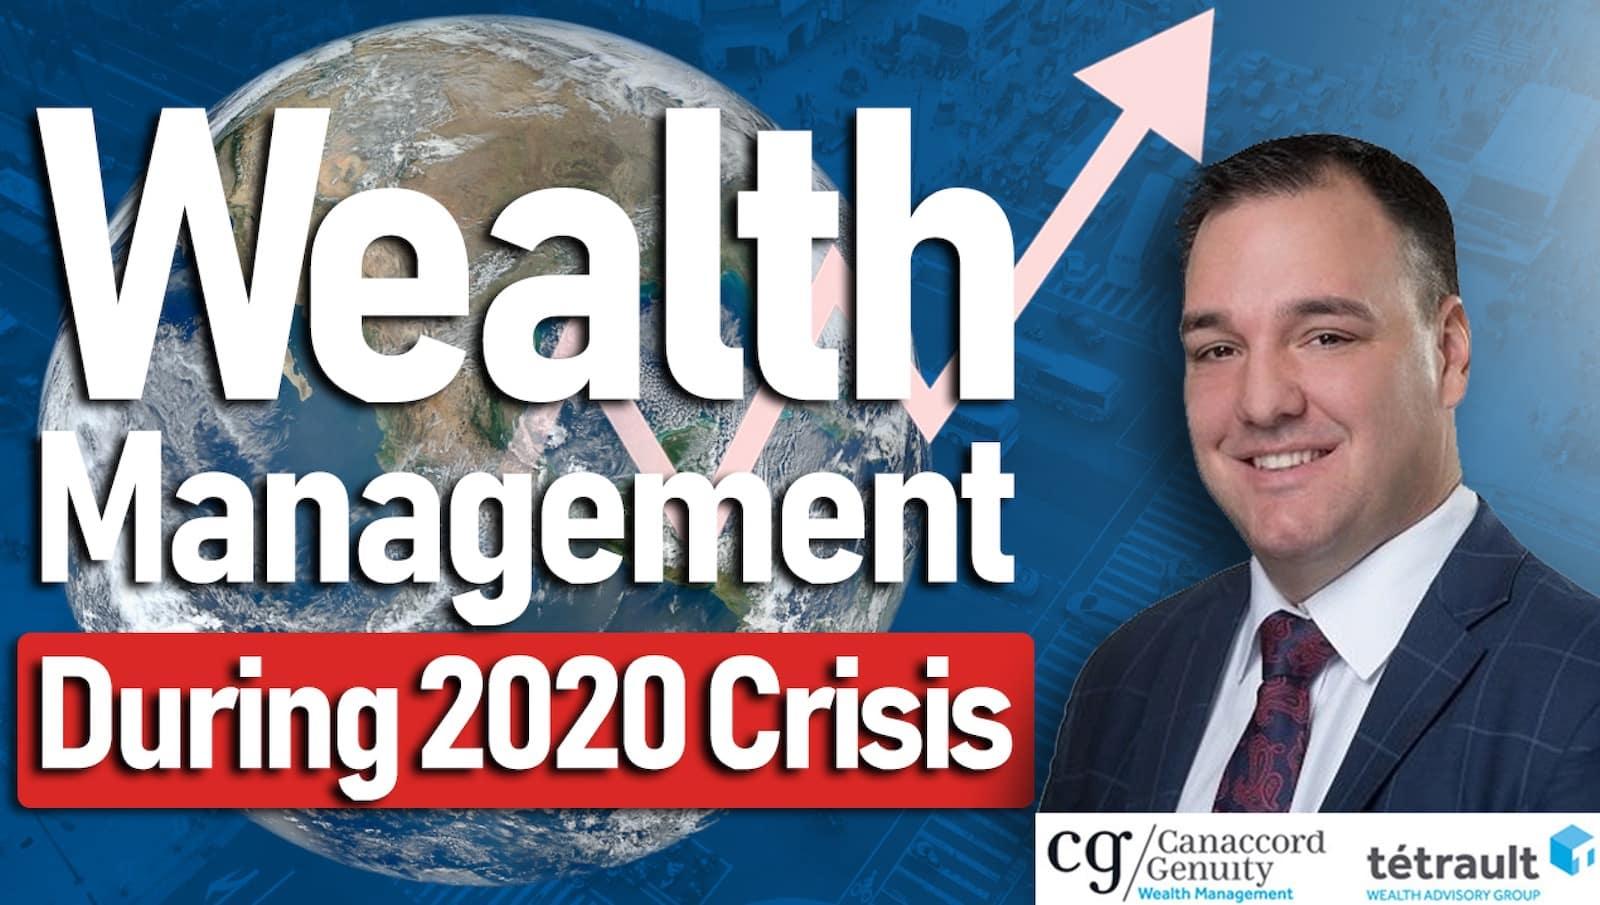 Wealth Management During 2020 Crisis